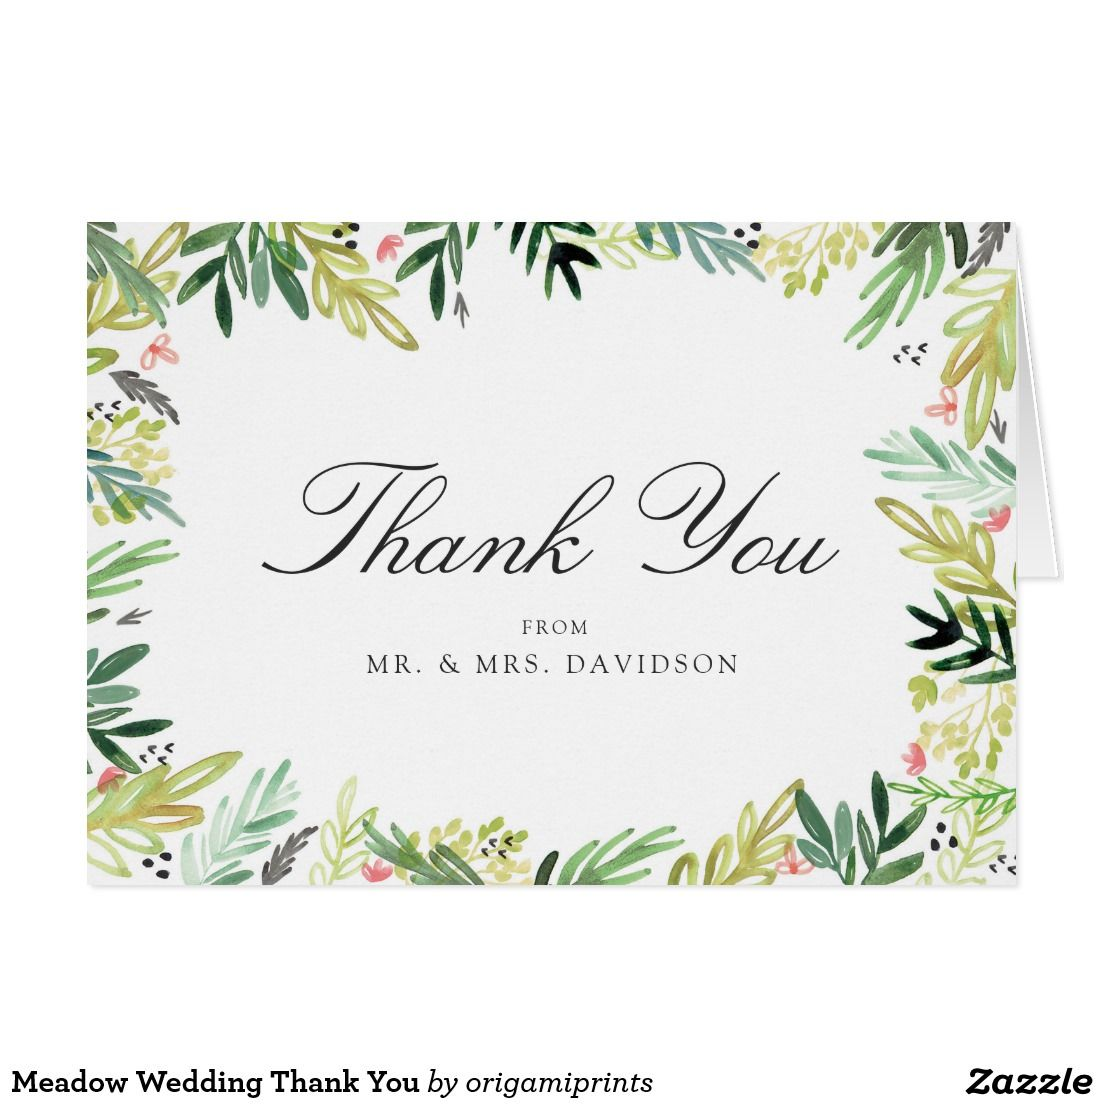 Meadow Wedding Thank You Zazzle Com Thank You Cards Wedding